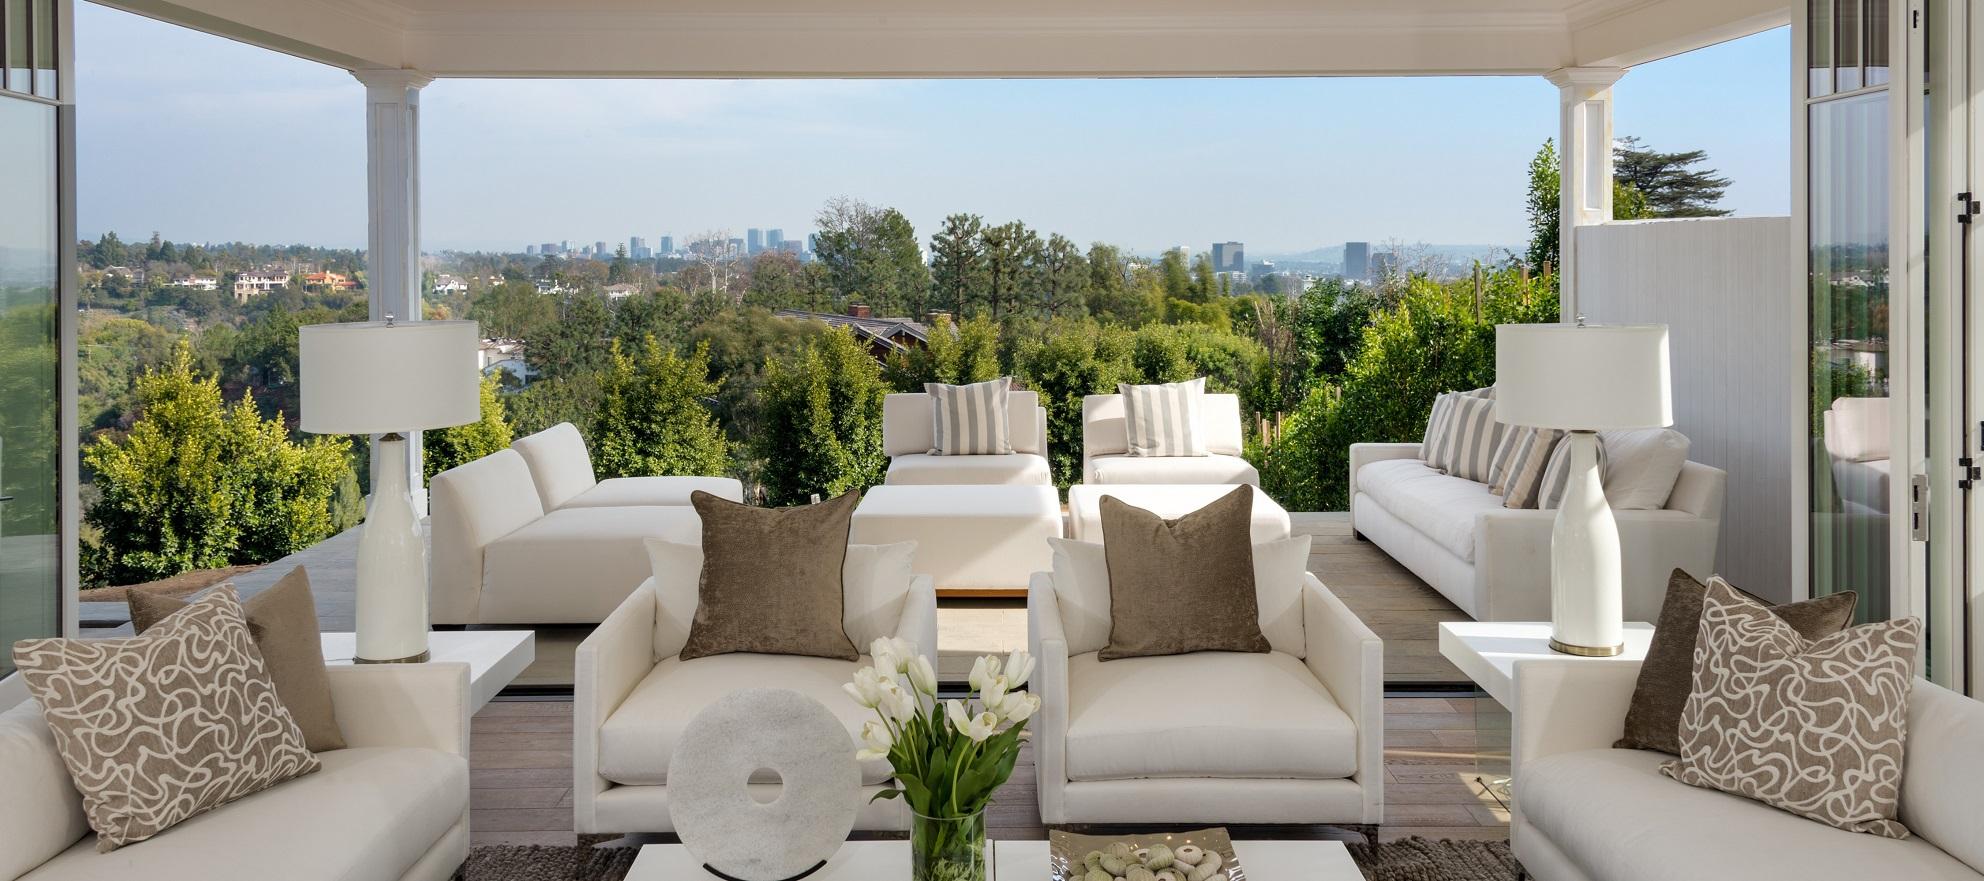 Luxury listing: Floor to ceiling views in Palisades Riviera